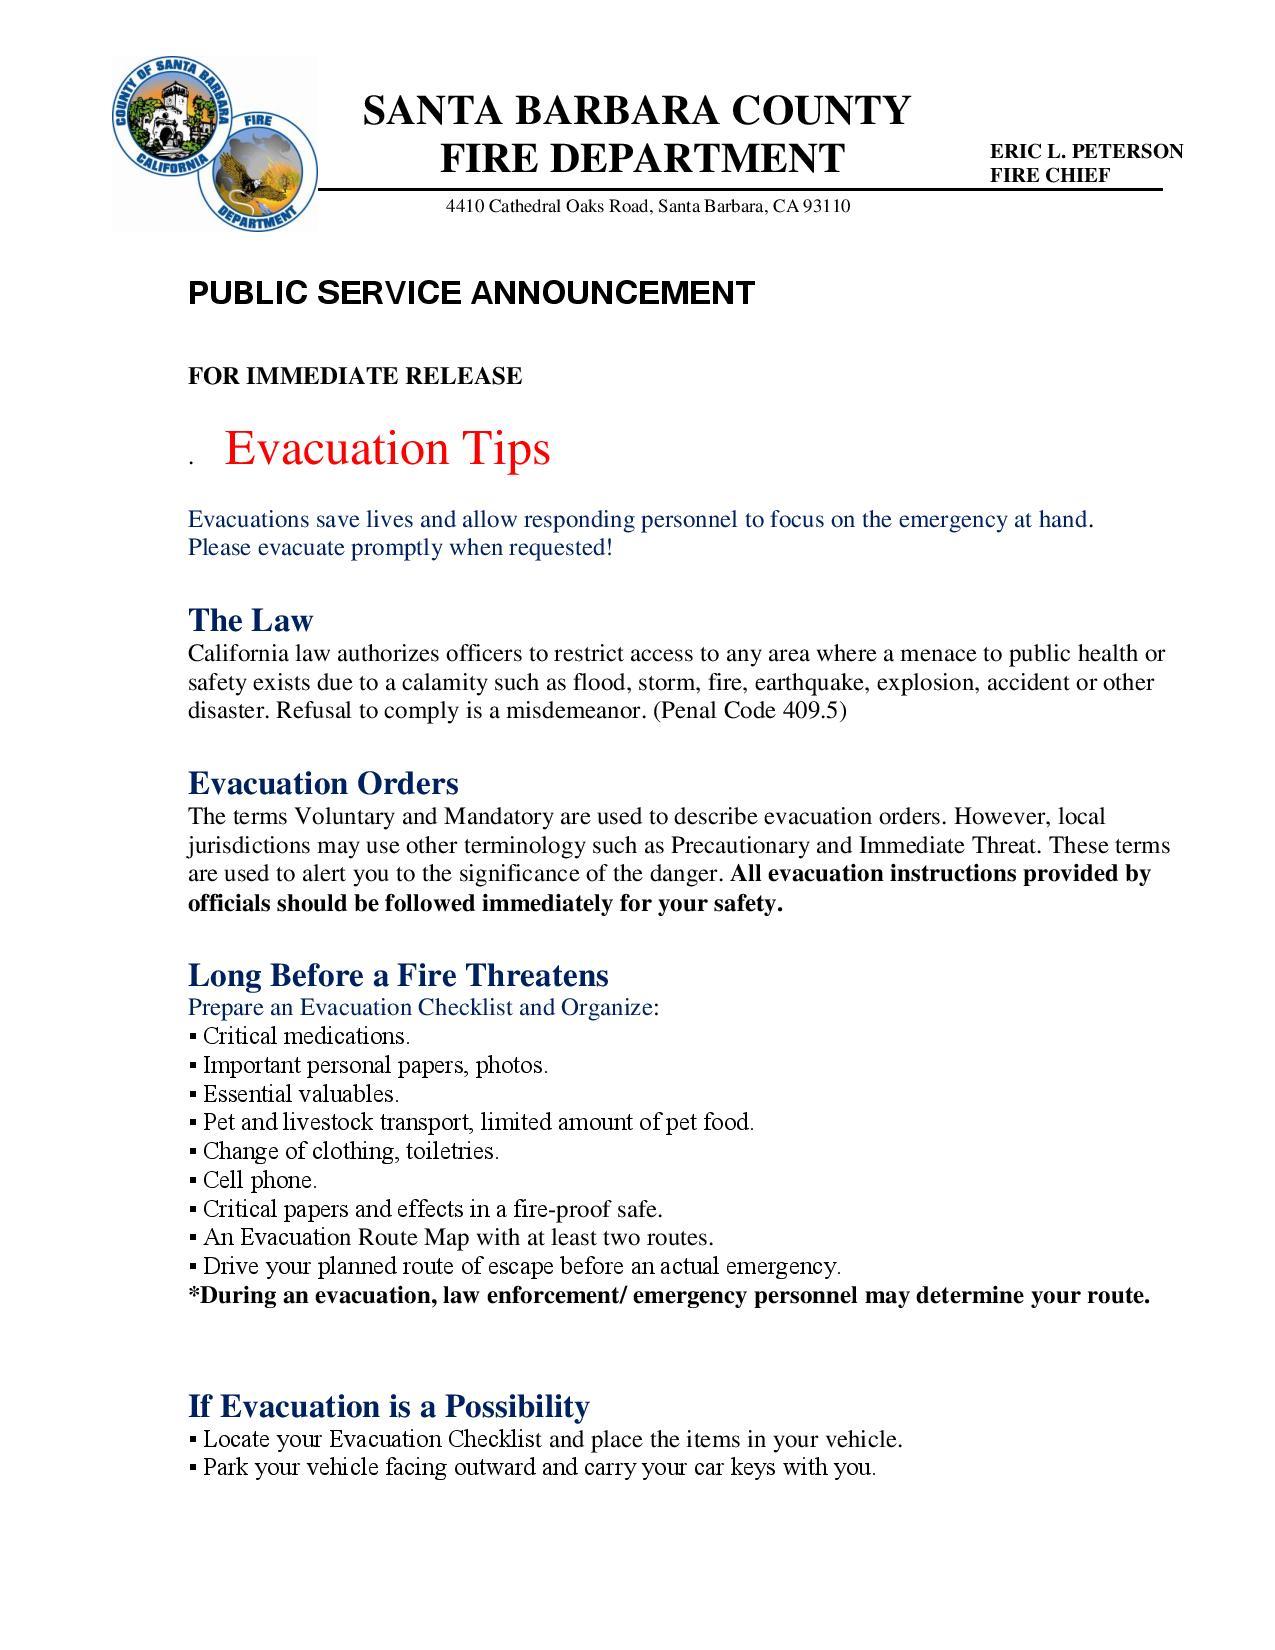 Evacuation Tips-pg1